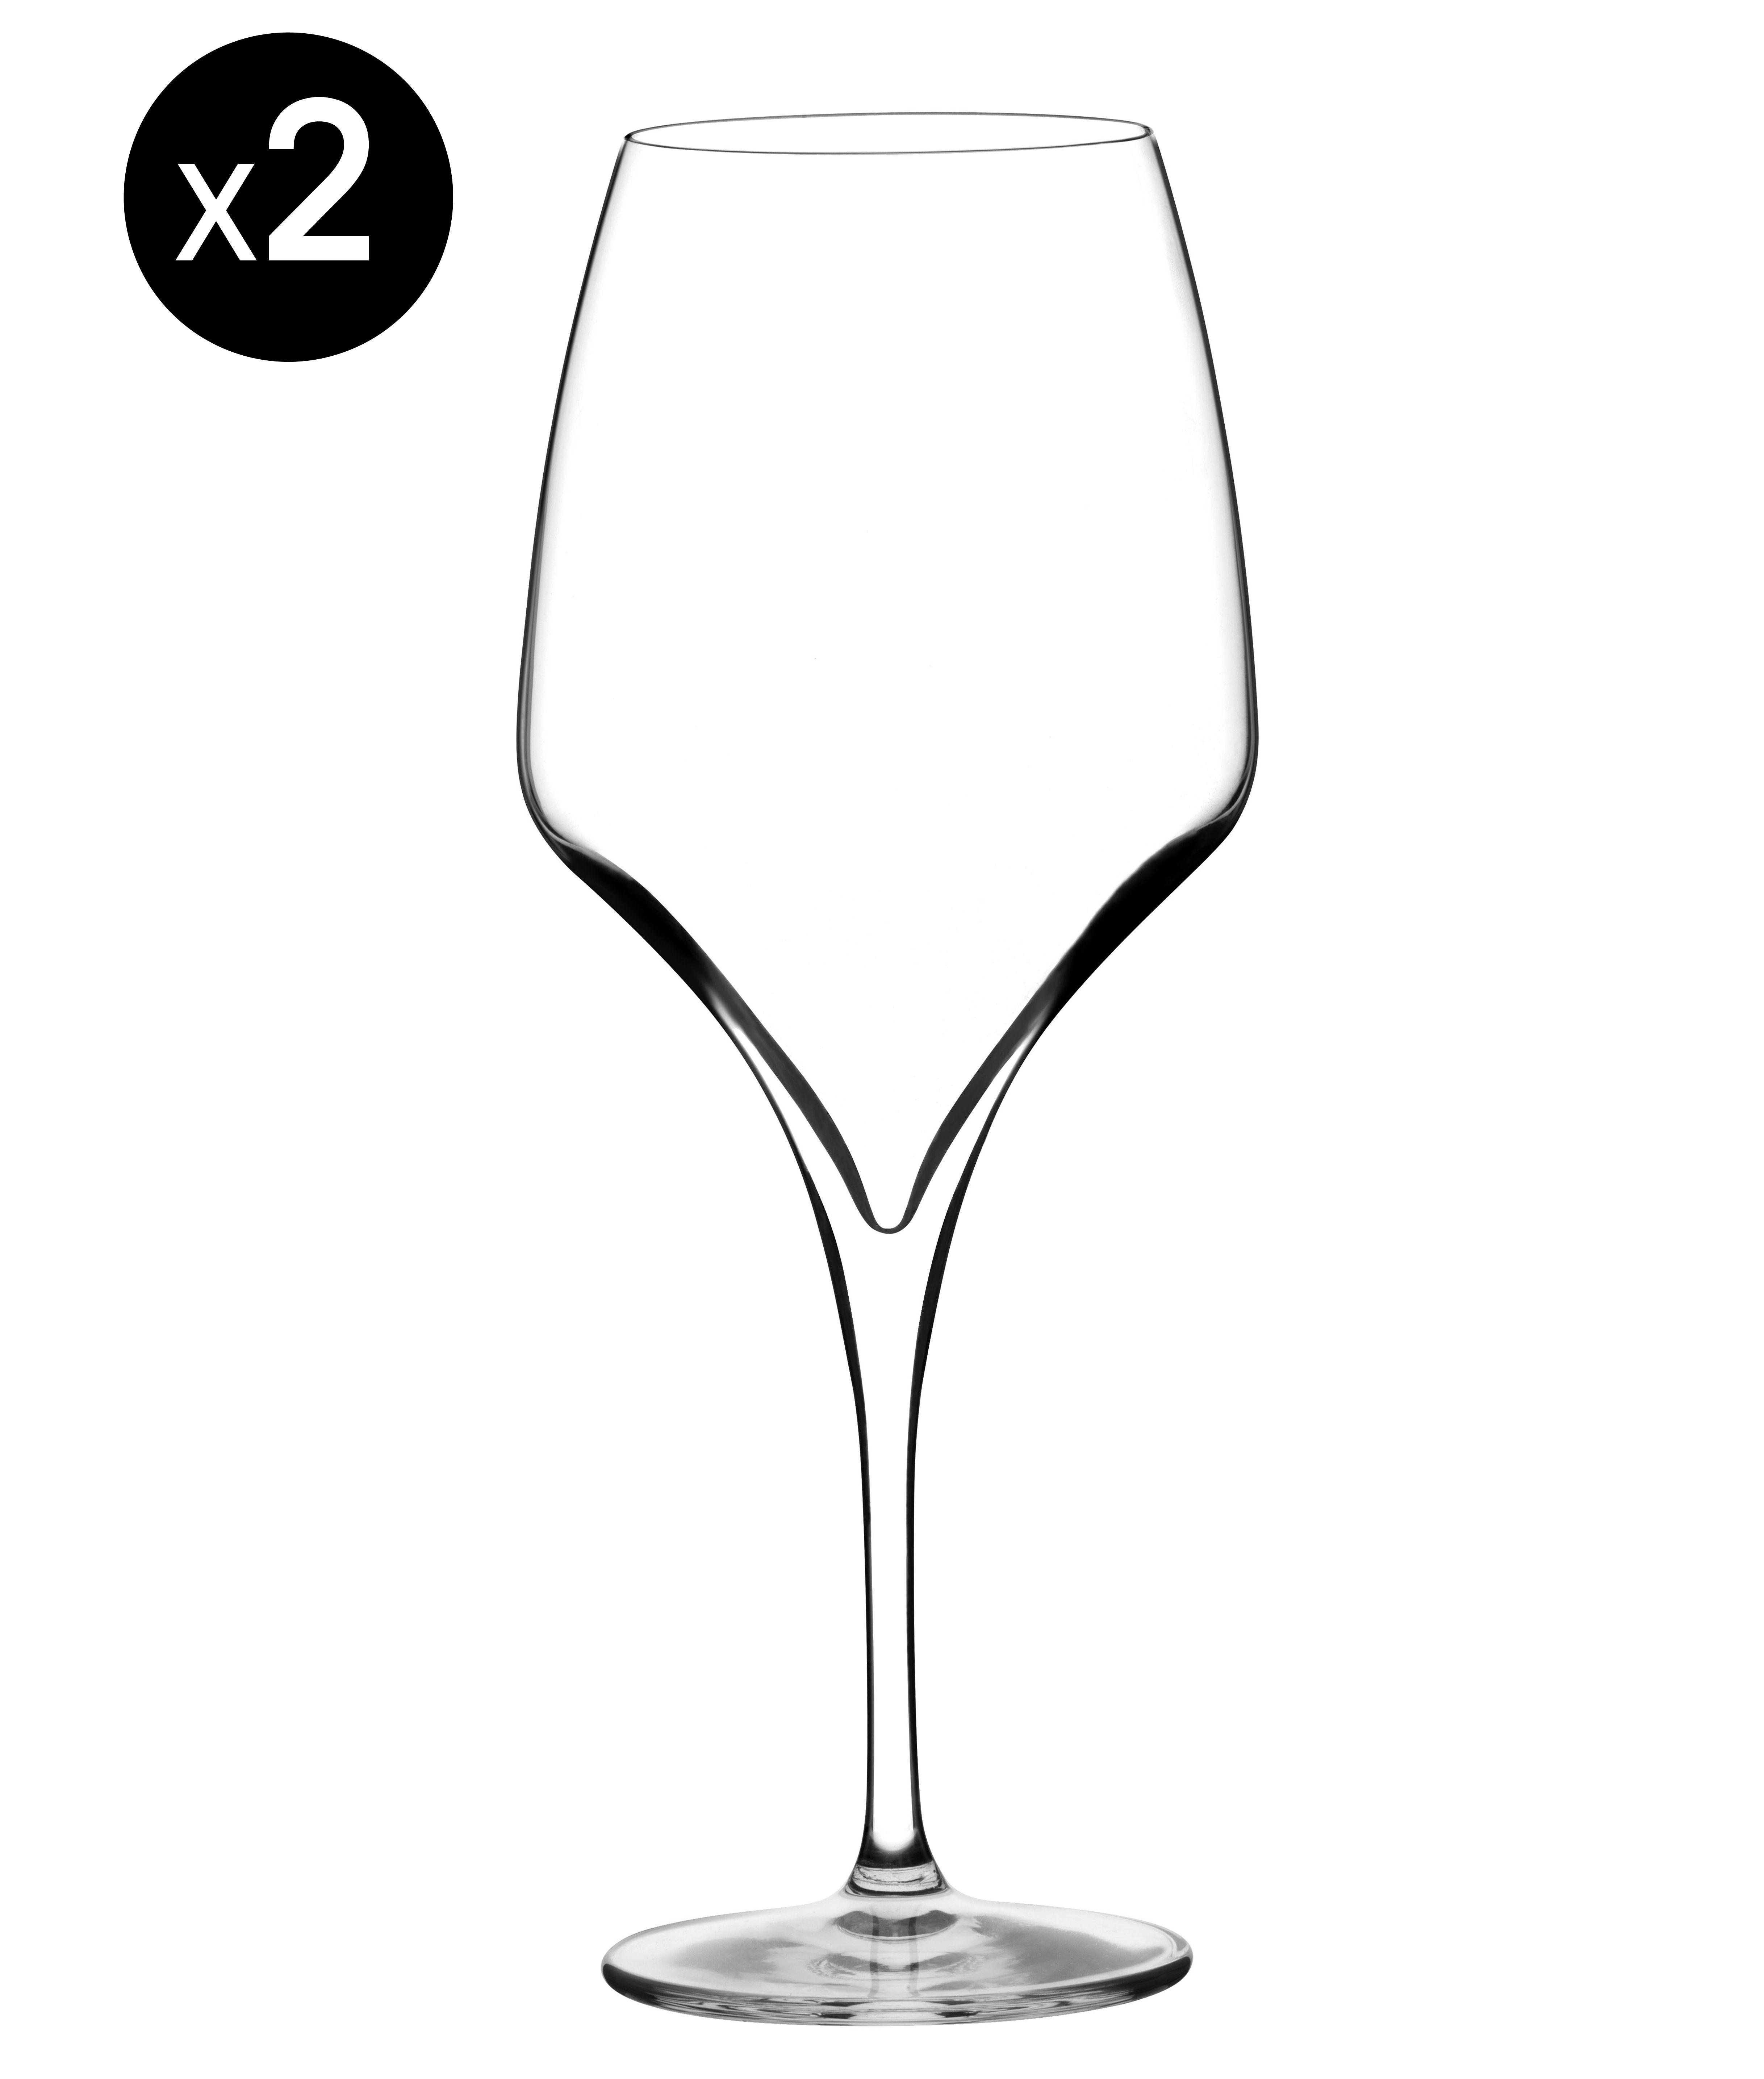 Tischkultur - Gläser - Tiburòn Magnum Weinglas / 80 cl - 2er Set - Italesse - 80 cl / transparent - mundgeblasenes Glas